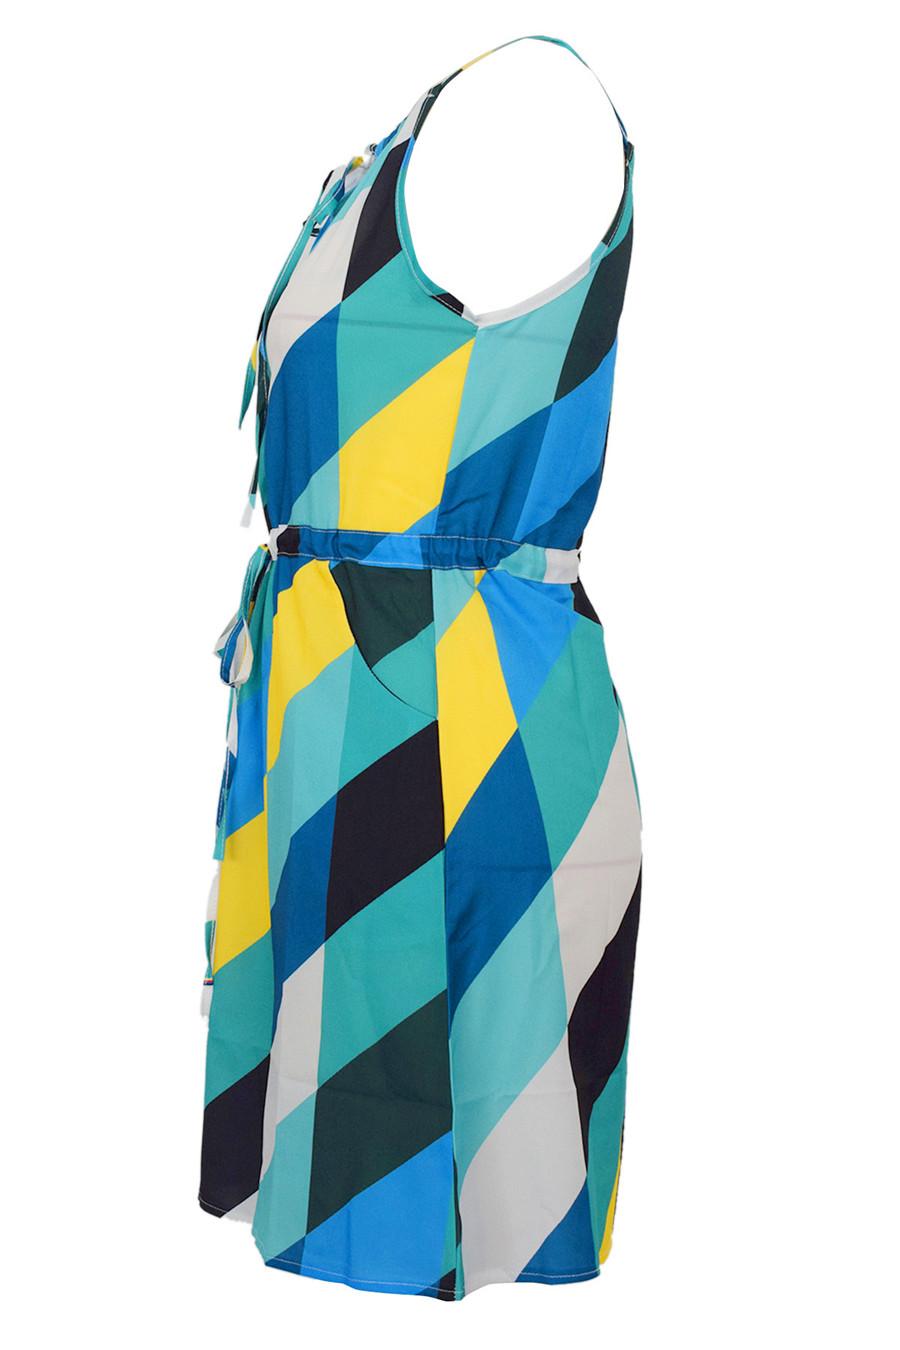 Gladiolus Chiffon Women Summer Dress Spaghetti Strap Floral Print Pocket Sexy Bohemian Beach Dress 2019 Short Ladies Dresses (21)